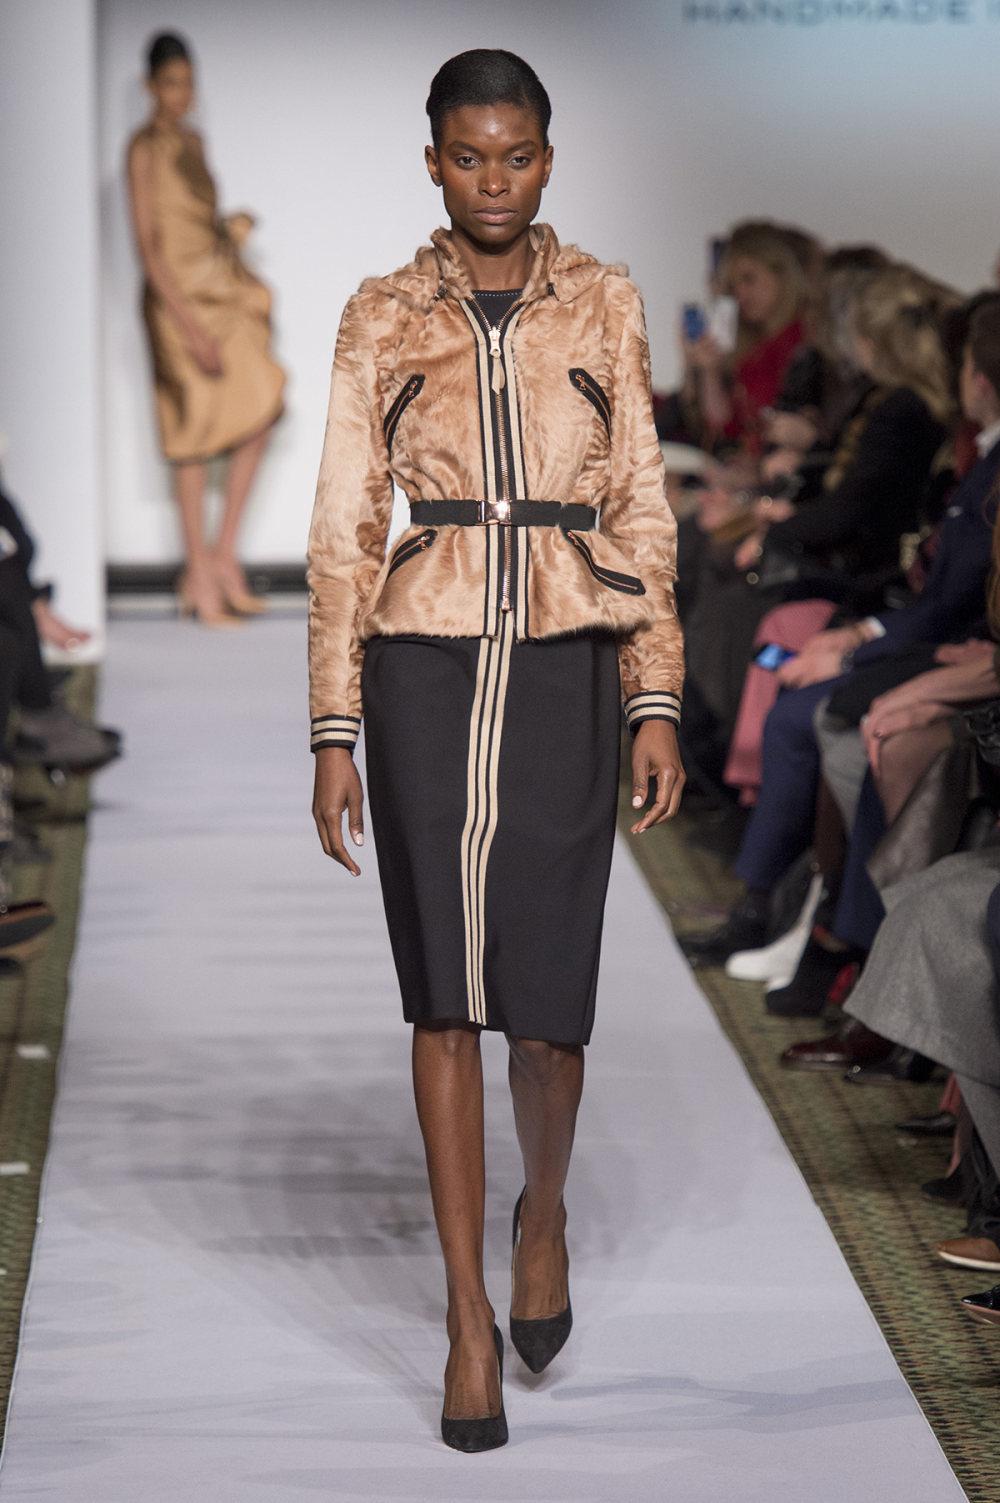 Carolina Herrera时装系列用鲜艳的颜色充满智能的黑白色调-40.jpg